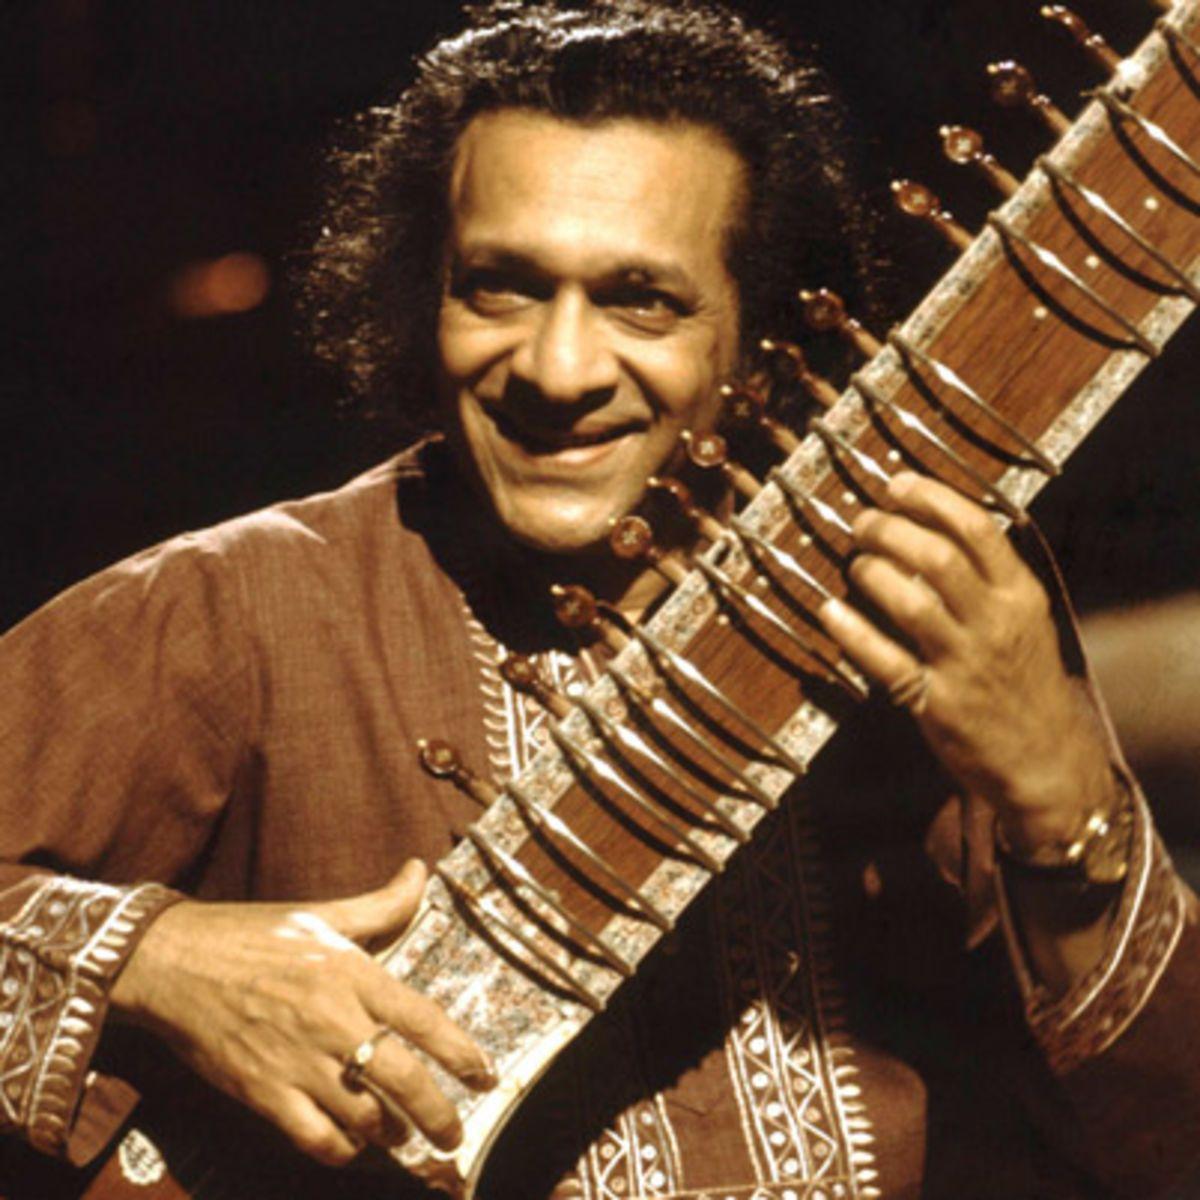 Ravi Shankar. Indian musician. 1920-1912 | Musician, Hindustani classical  music, Concert for bangladesh